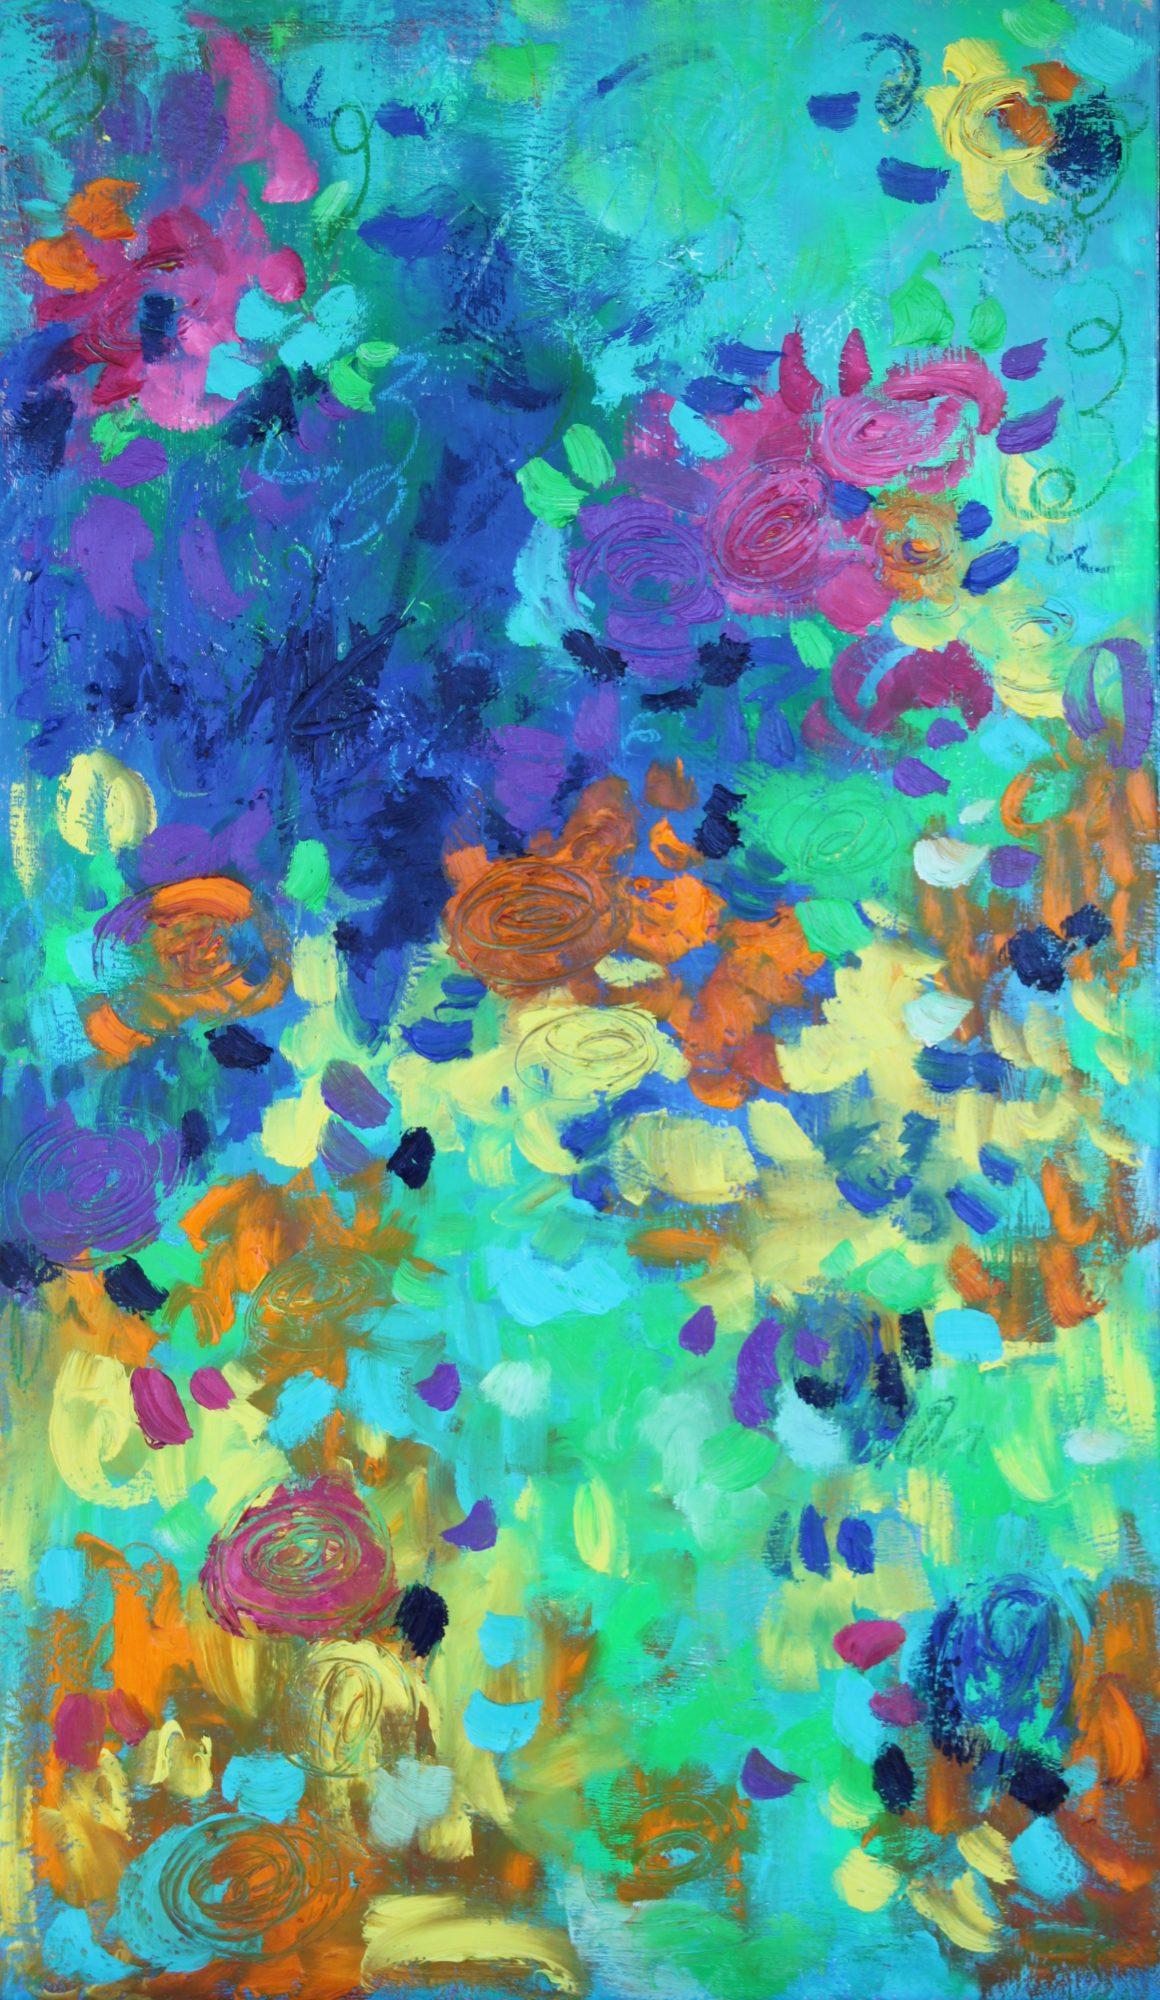 belinda-nadwie-art-abstract-stdney-artist-season of love2